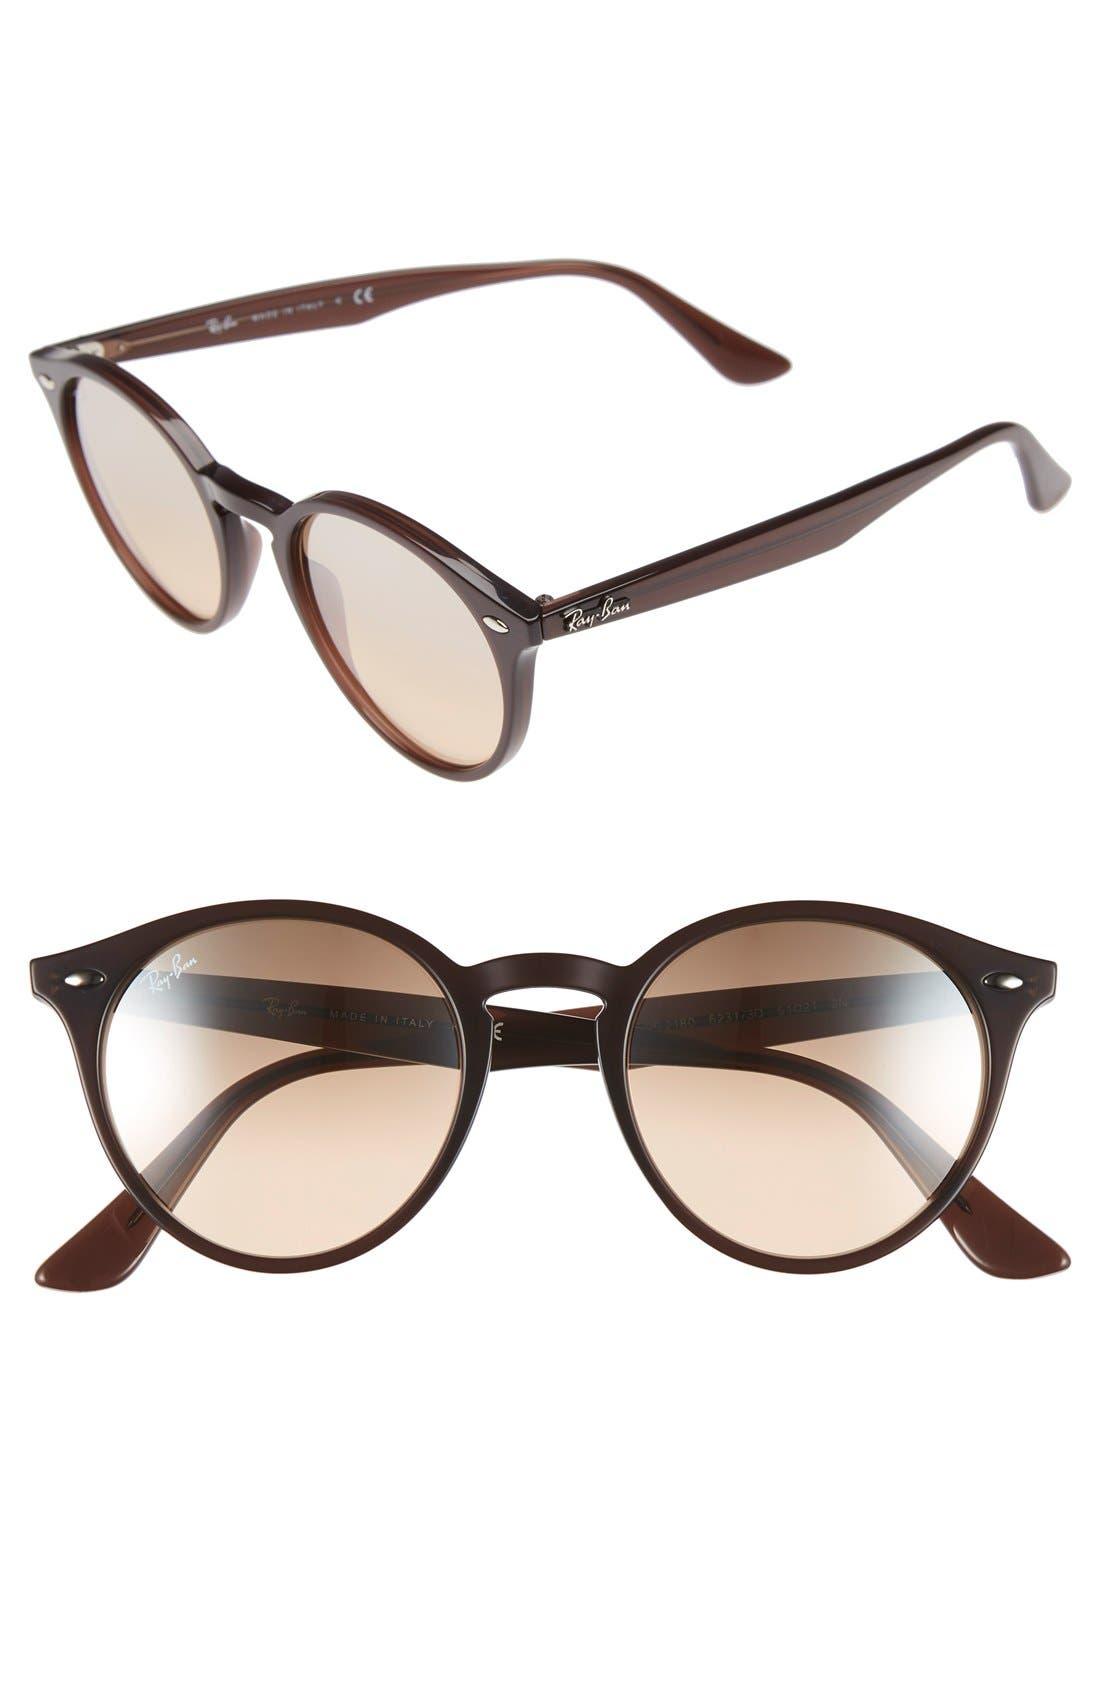 Highstreet 51mm Round Sunglasses,                         Main,                         color, Dark Brown